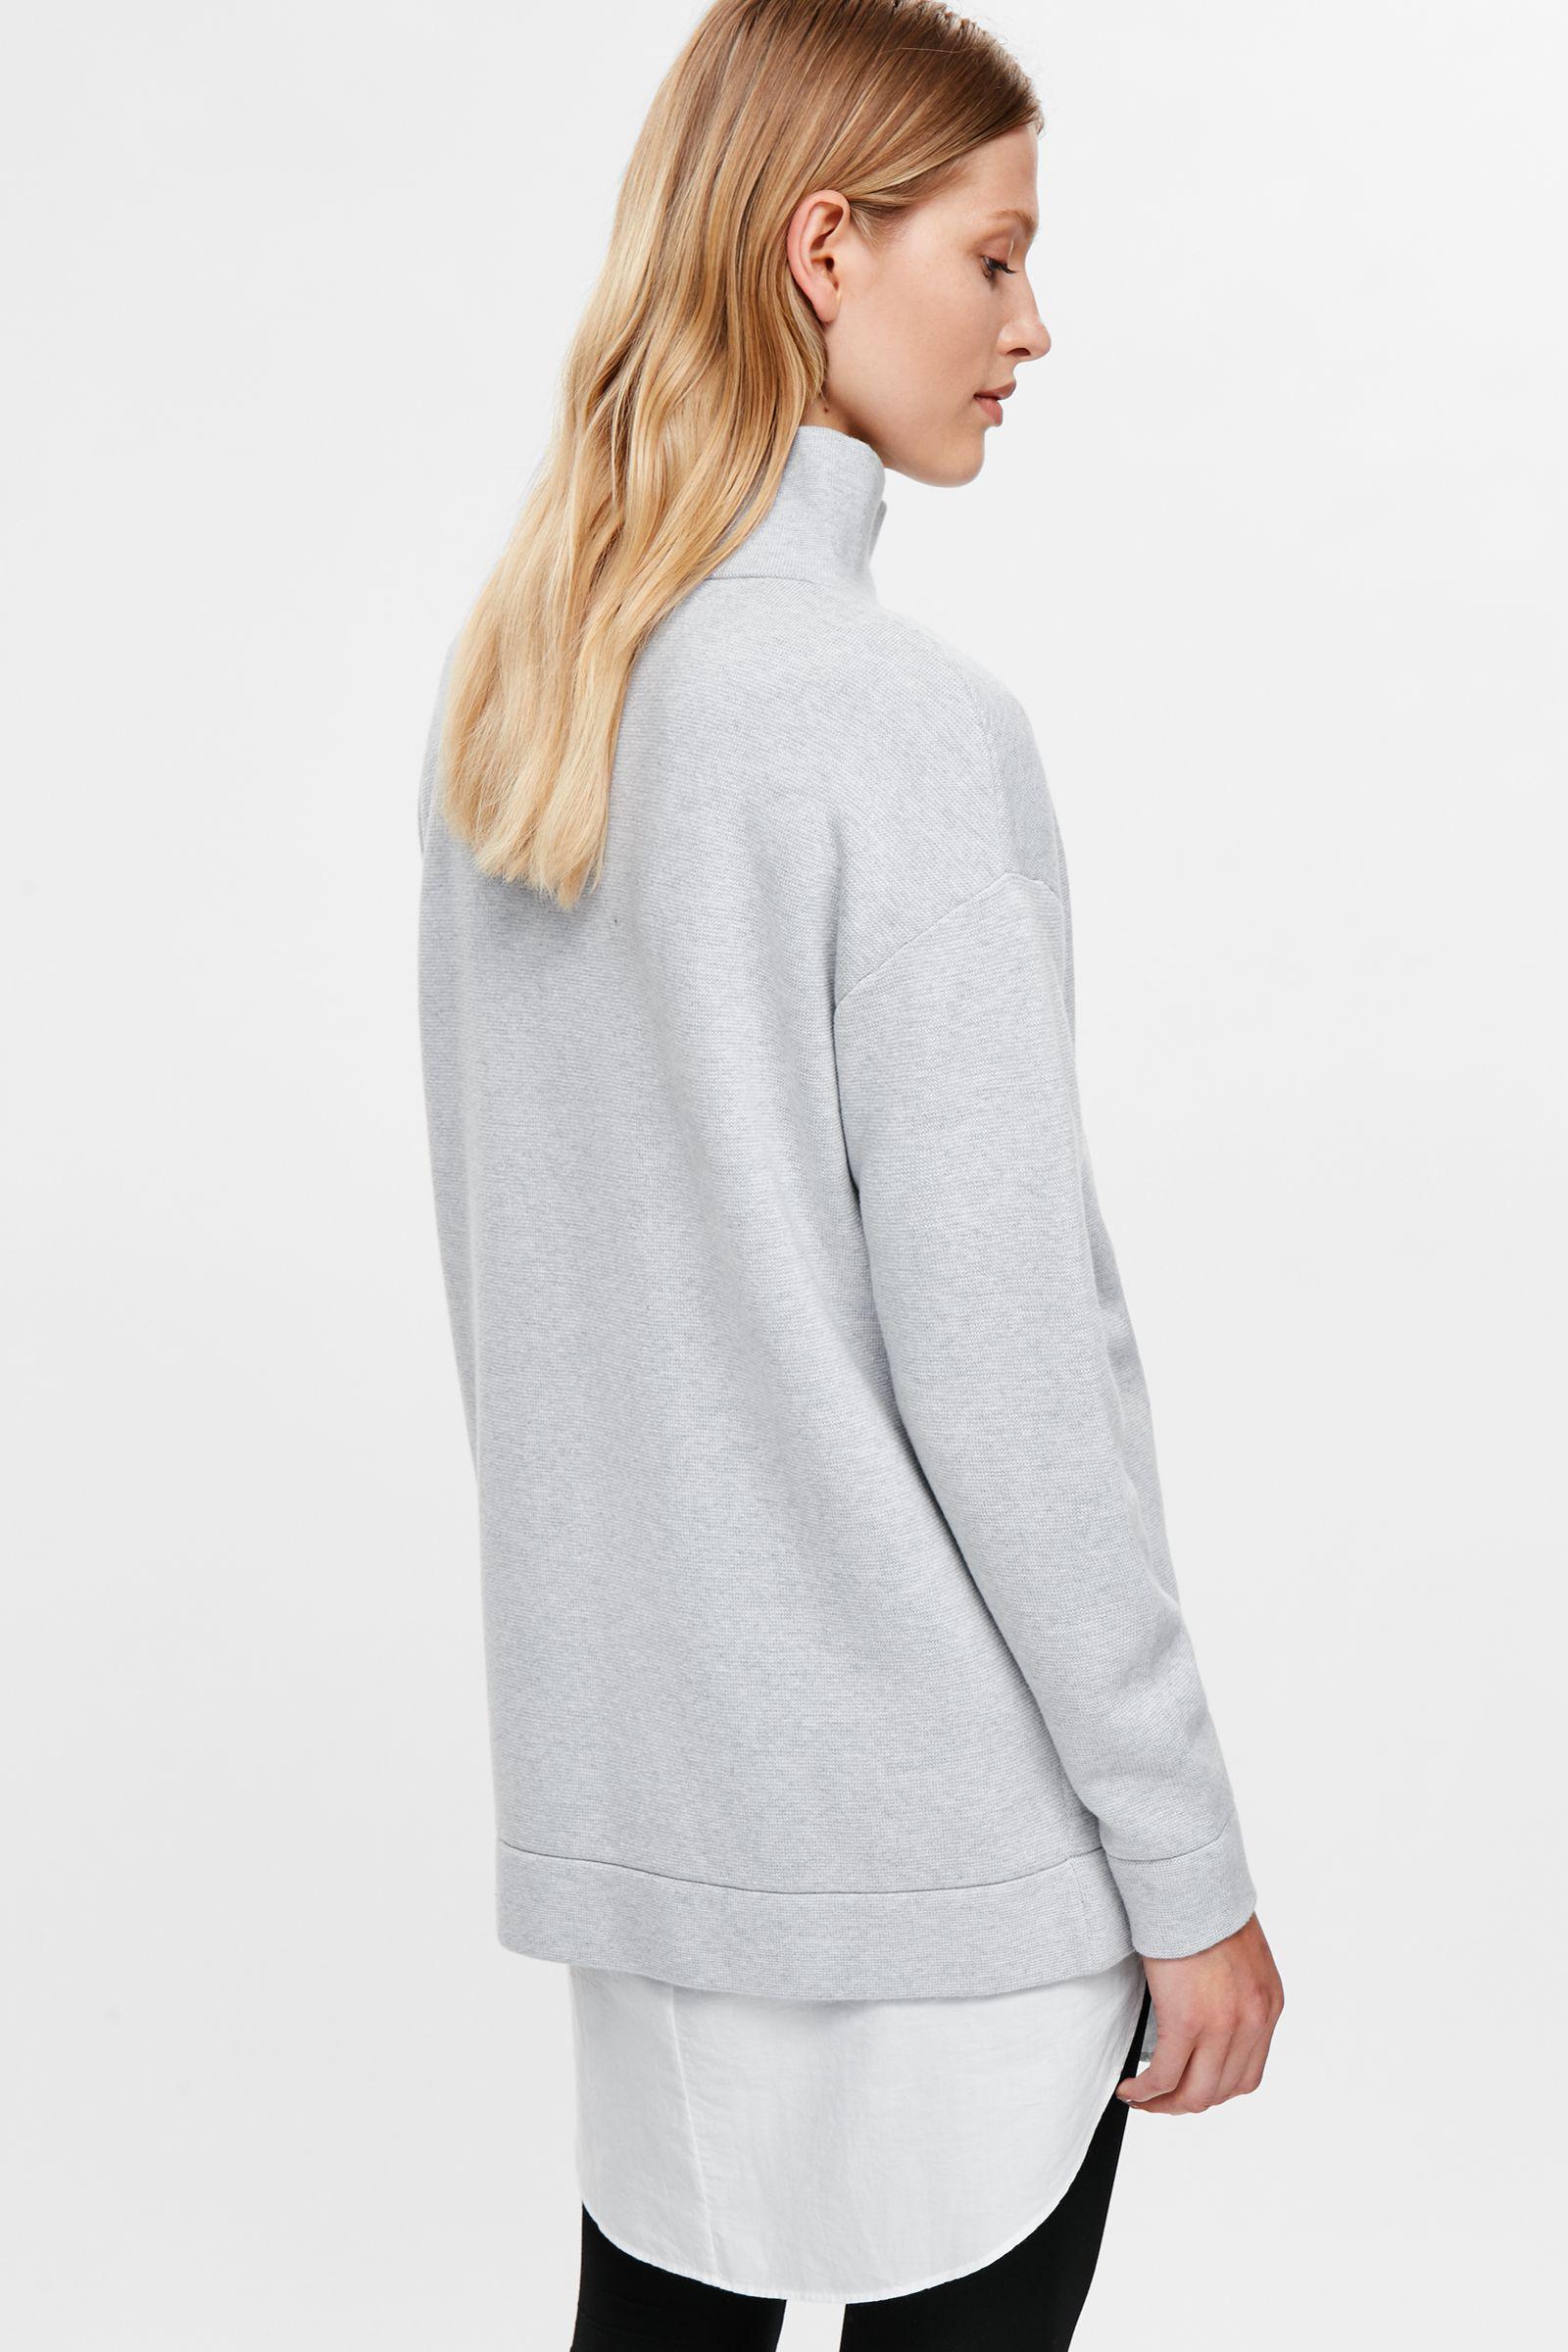 7ef7922fd Lyst - COS Oversized Milano Knit Jumper in Gray